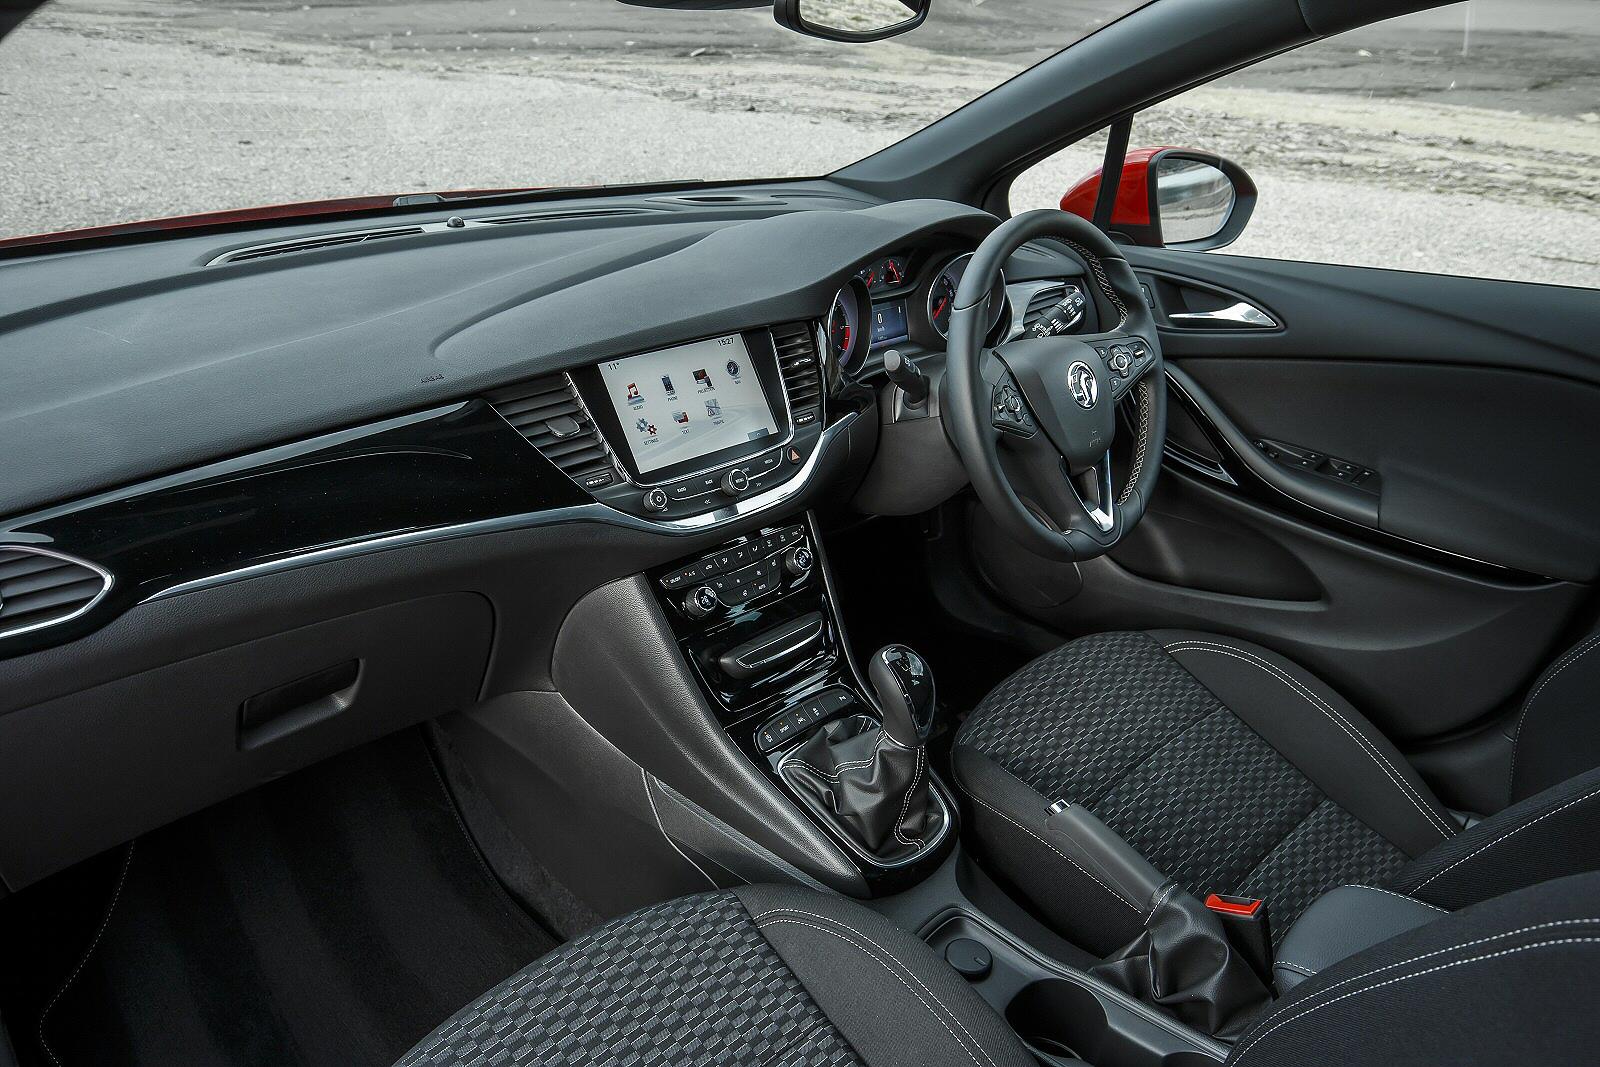 Vauxhall Astra Sri 14i 150ps Turbo Review - Vauxhall Astra ...